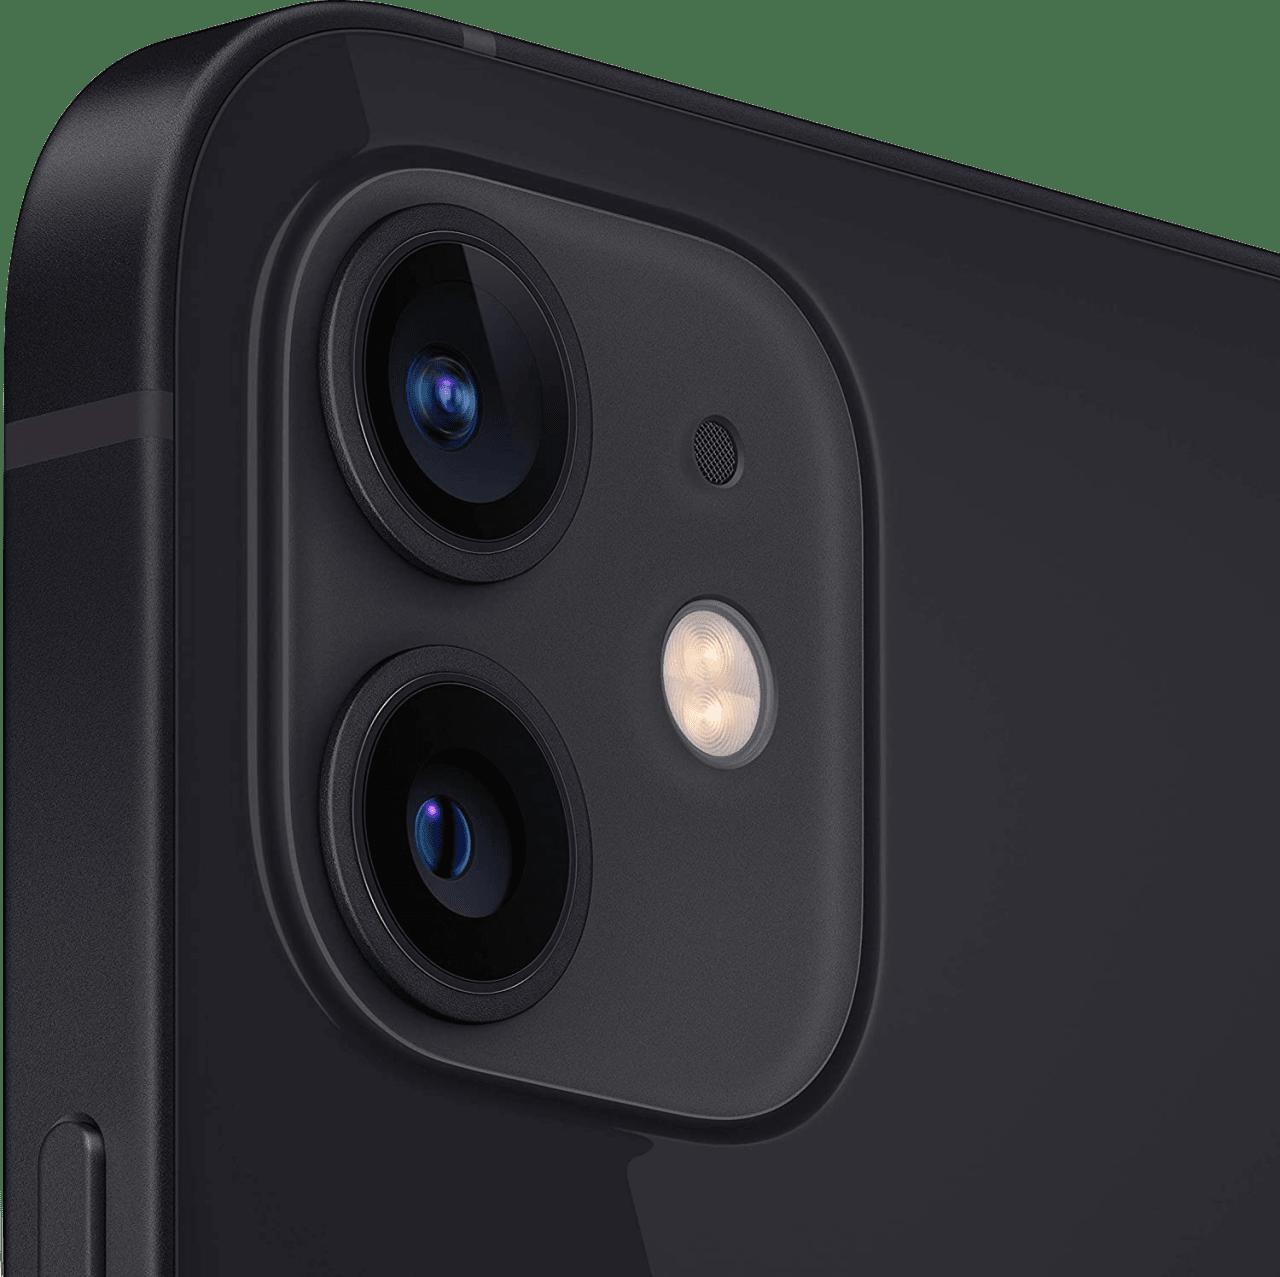 Black Apple iPhone 12 - 64GB - Dual SIM.4